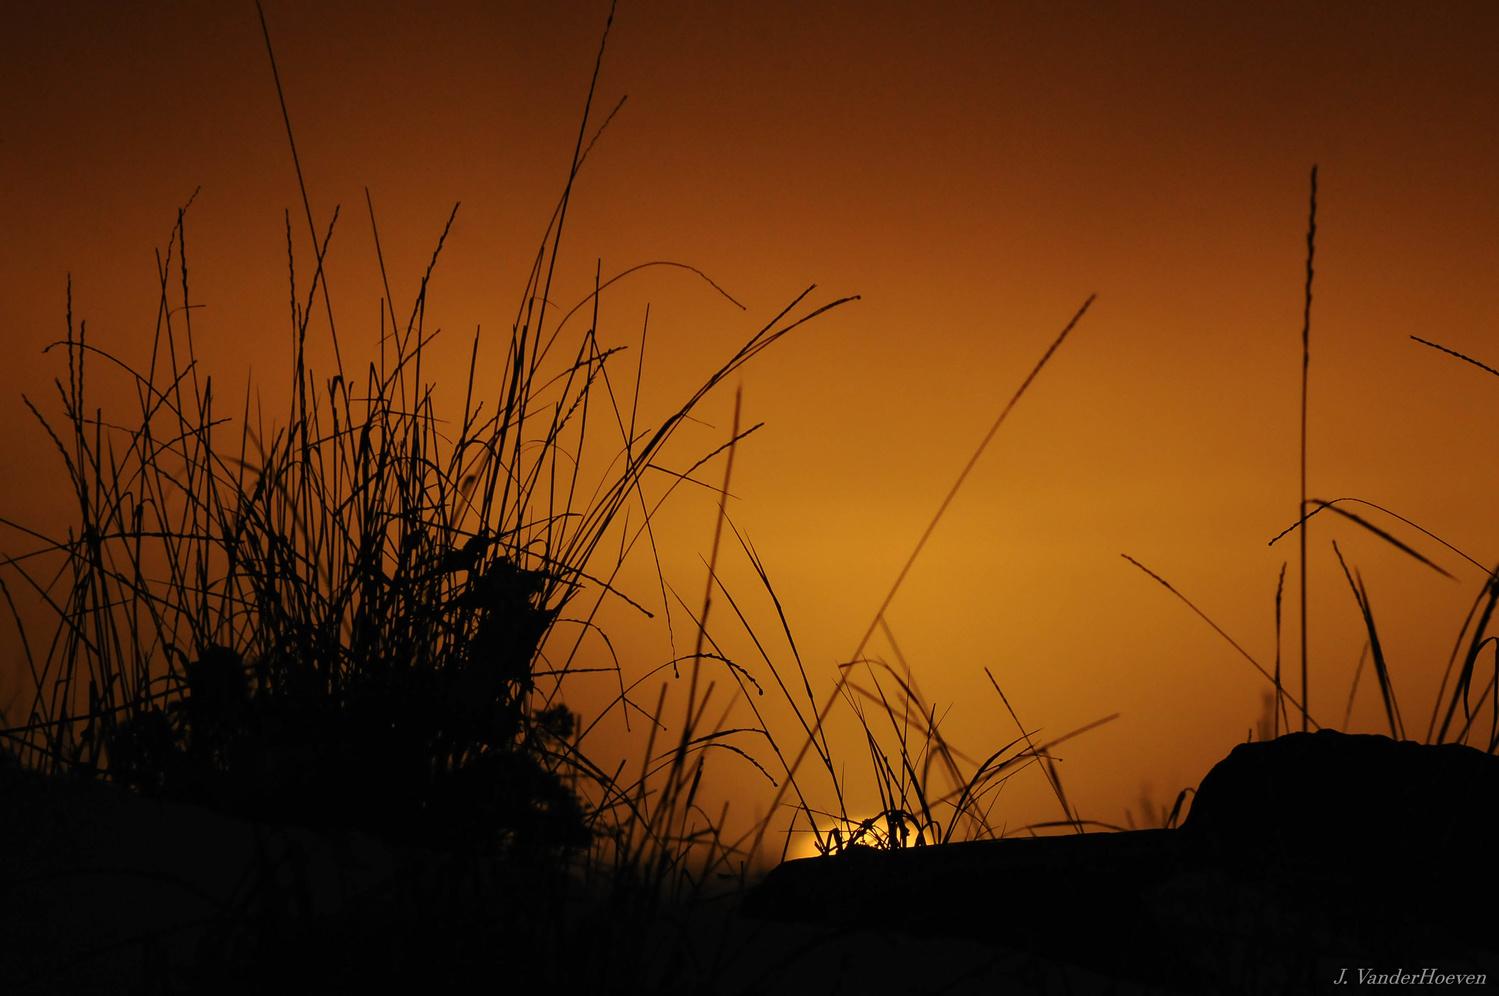 Wetland Sunset by Jake VanderHoeven